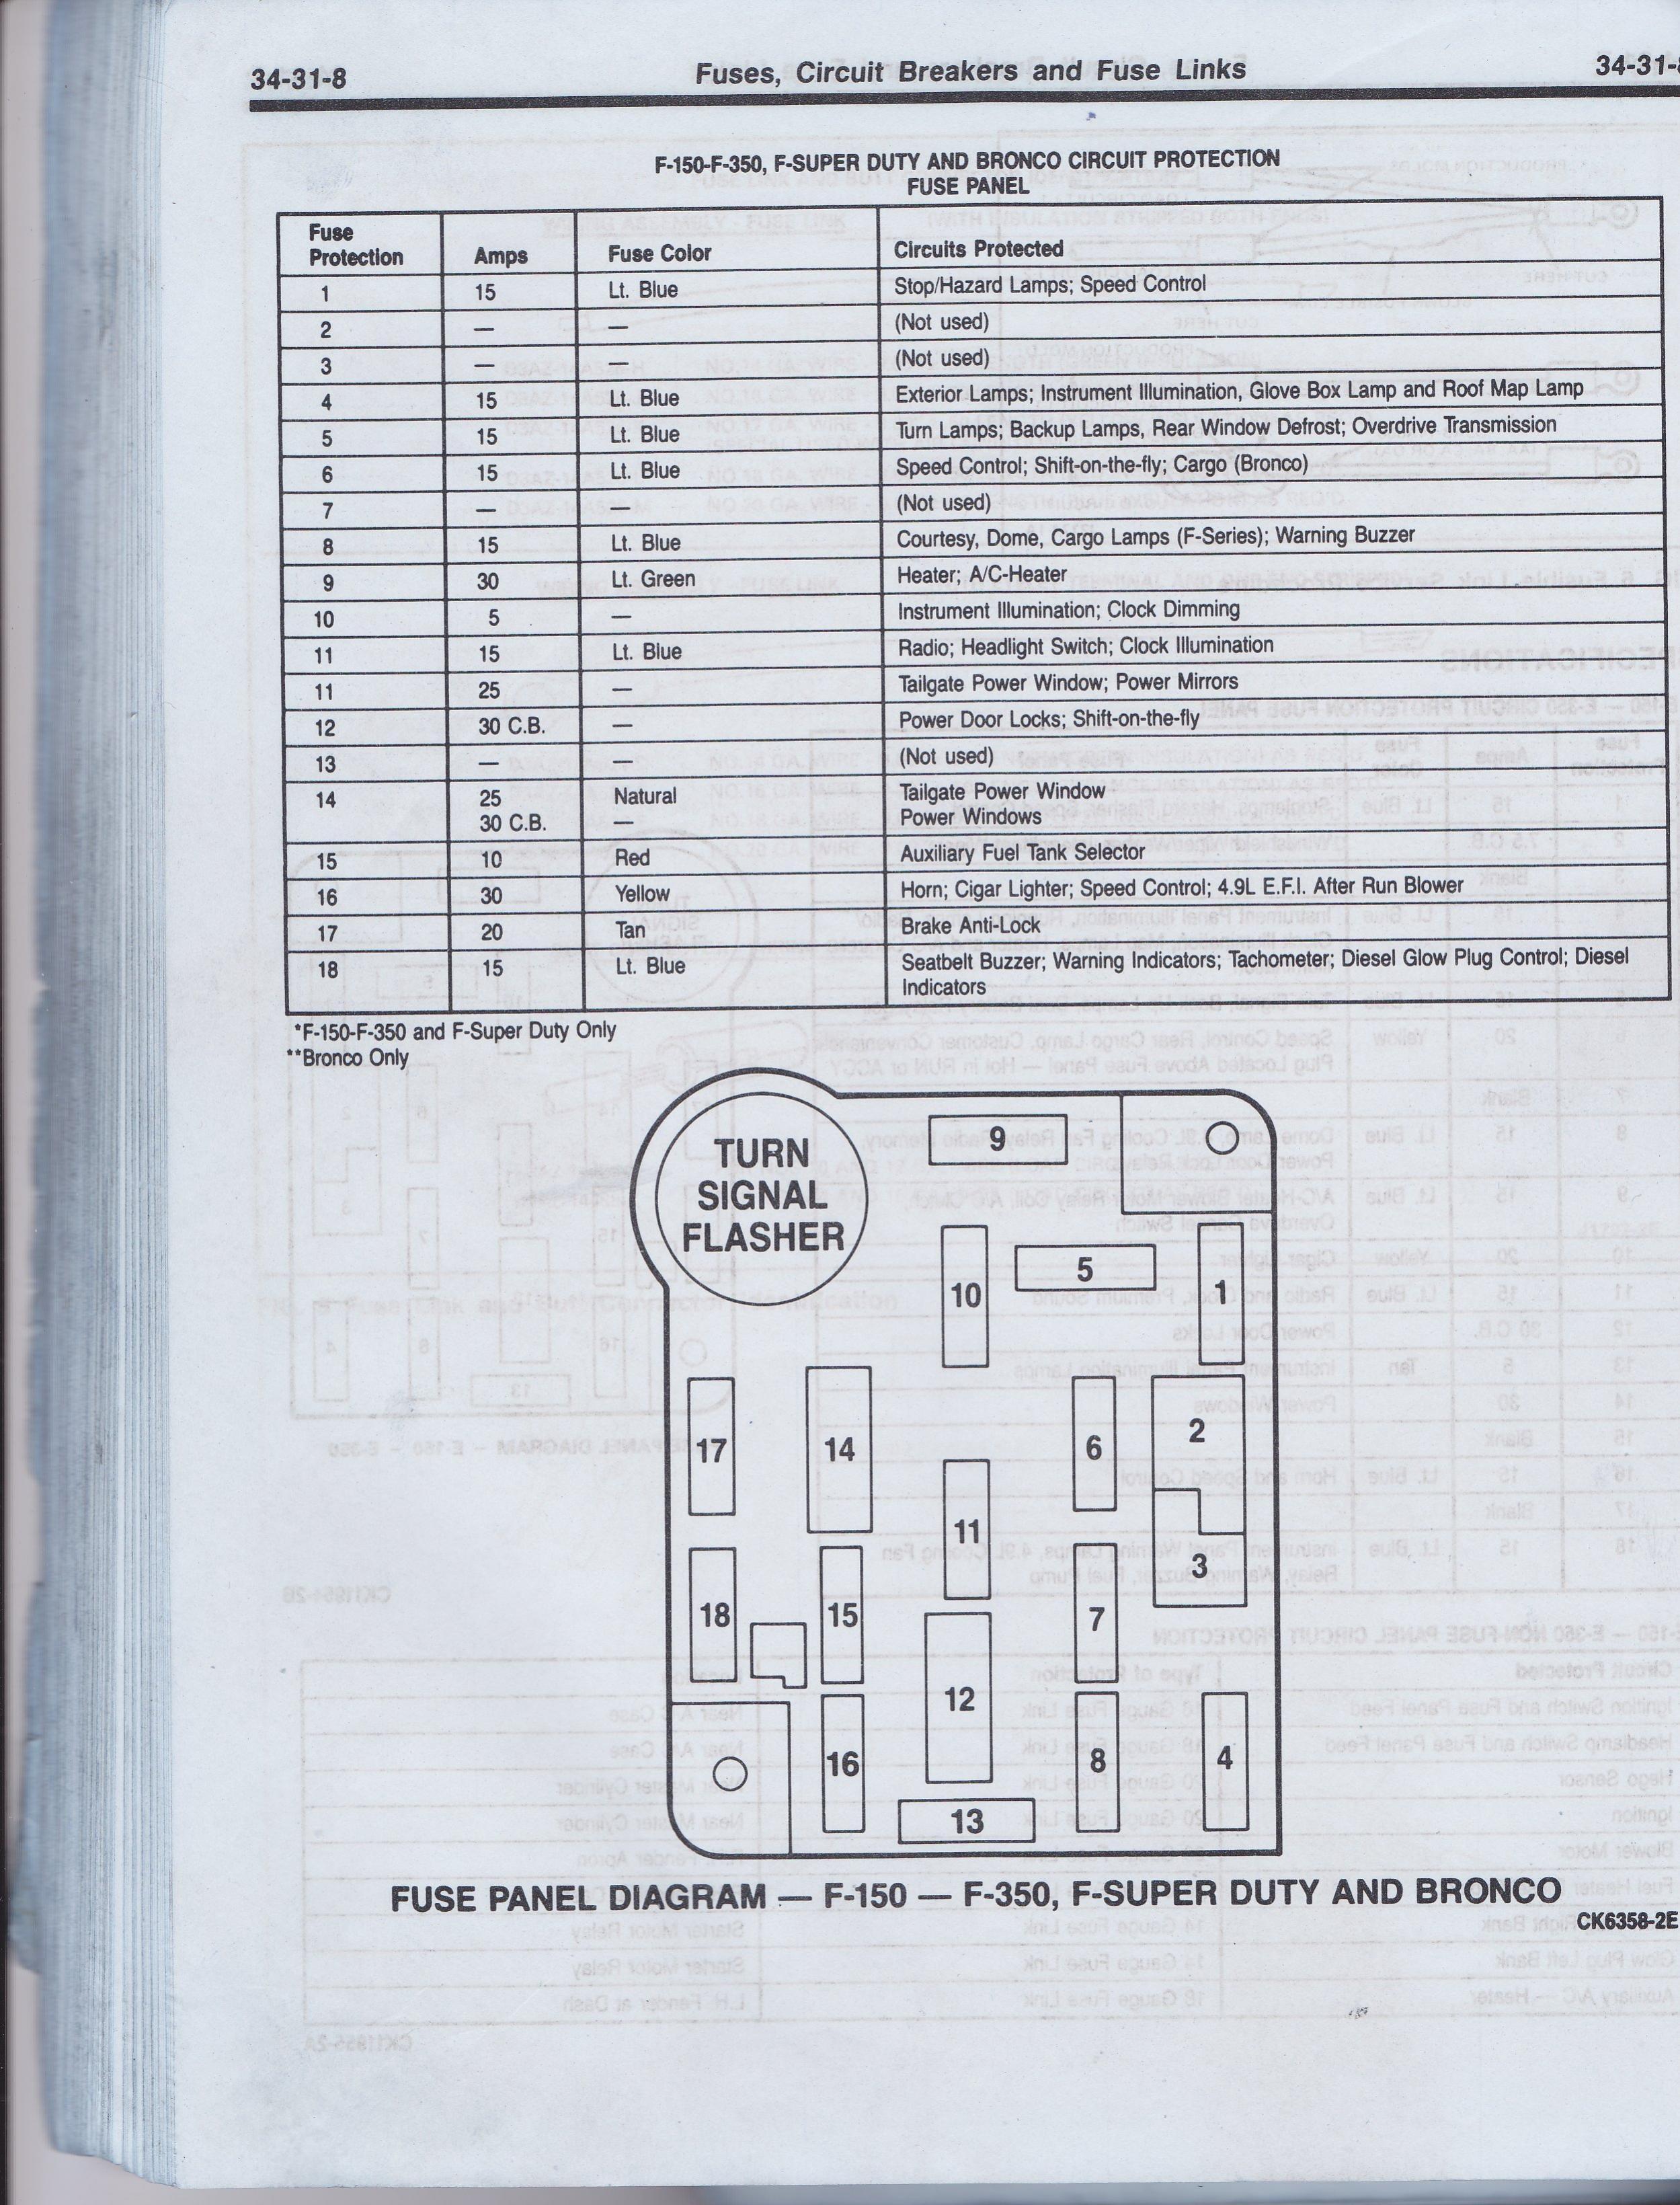 1989 ford 7.3 Idi Diesel Glow Plug Controller Diagram 89 F350 Coolant Temperature Sensor Page 2 Of 1989 ford 7.3 Idi Diesel Glow Plug Controller Diagram